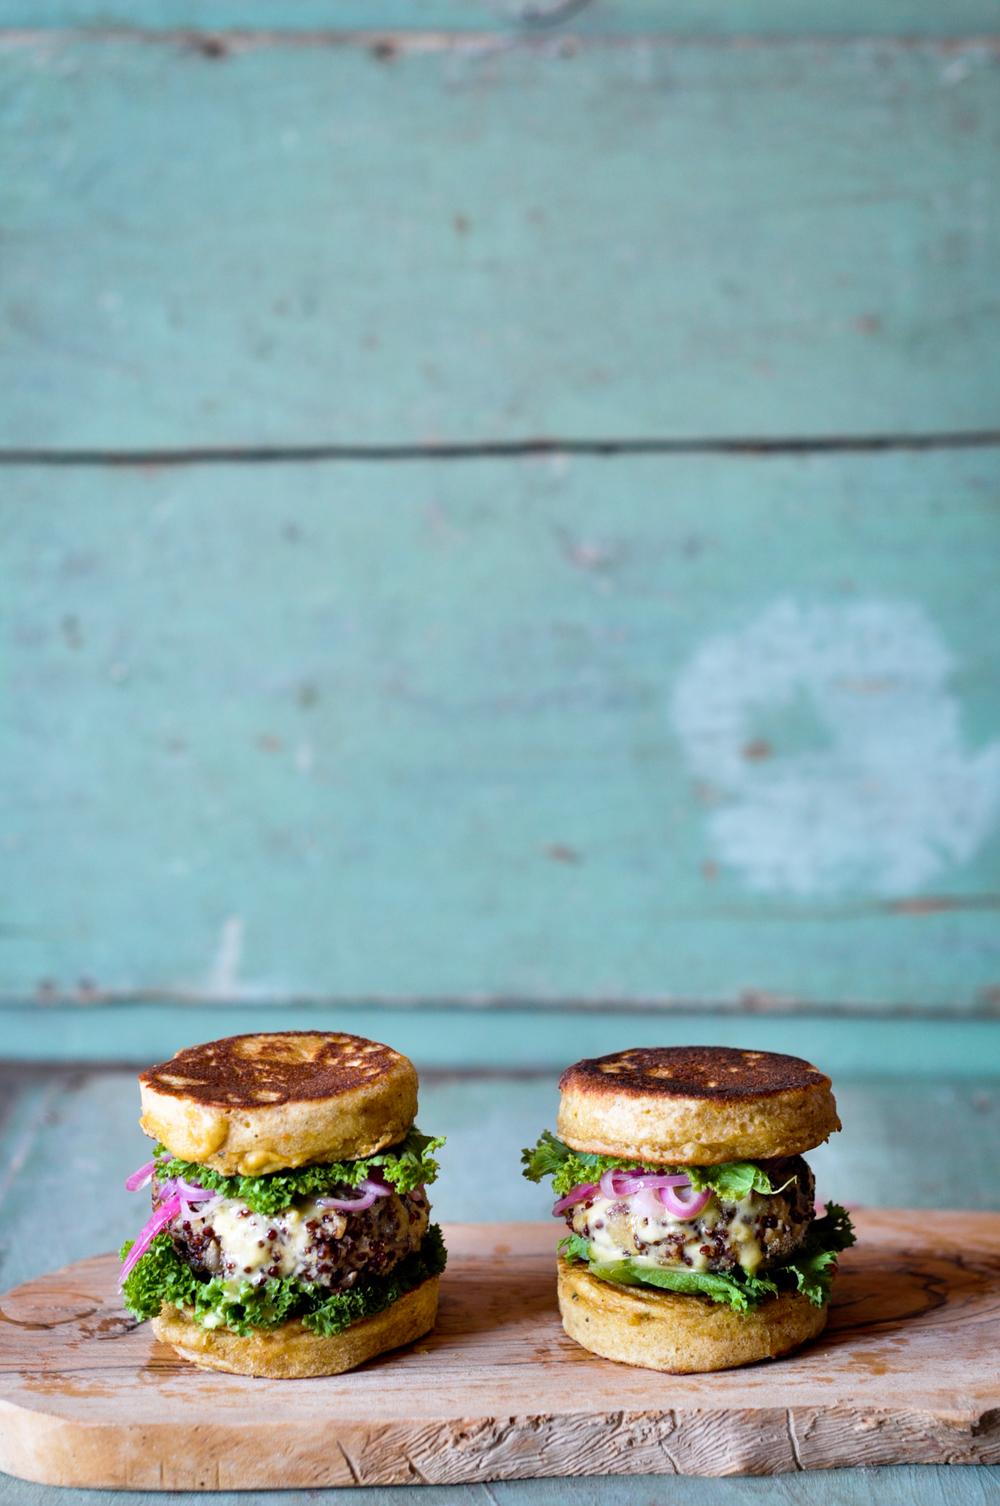 Chickpea Burger Buns sandwich a Quinoa Burger